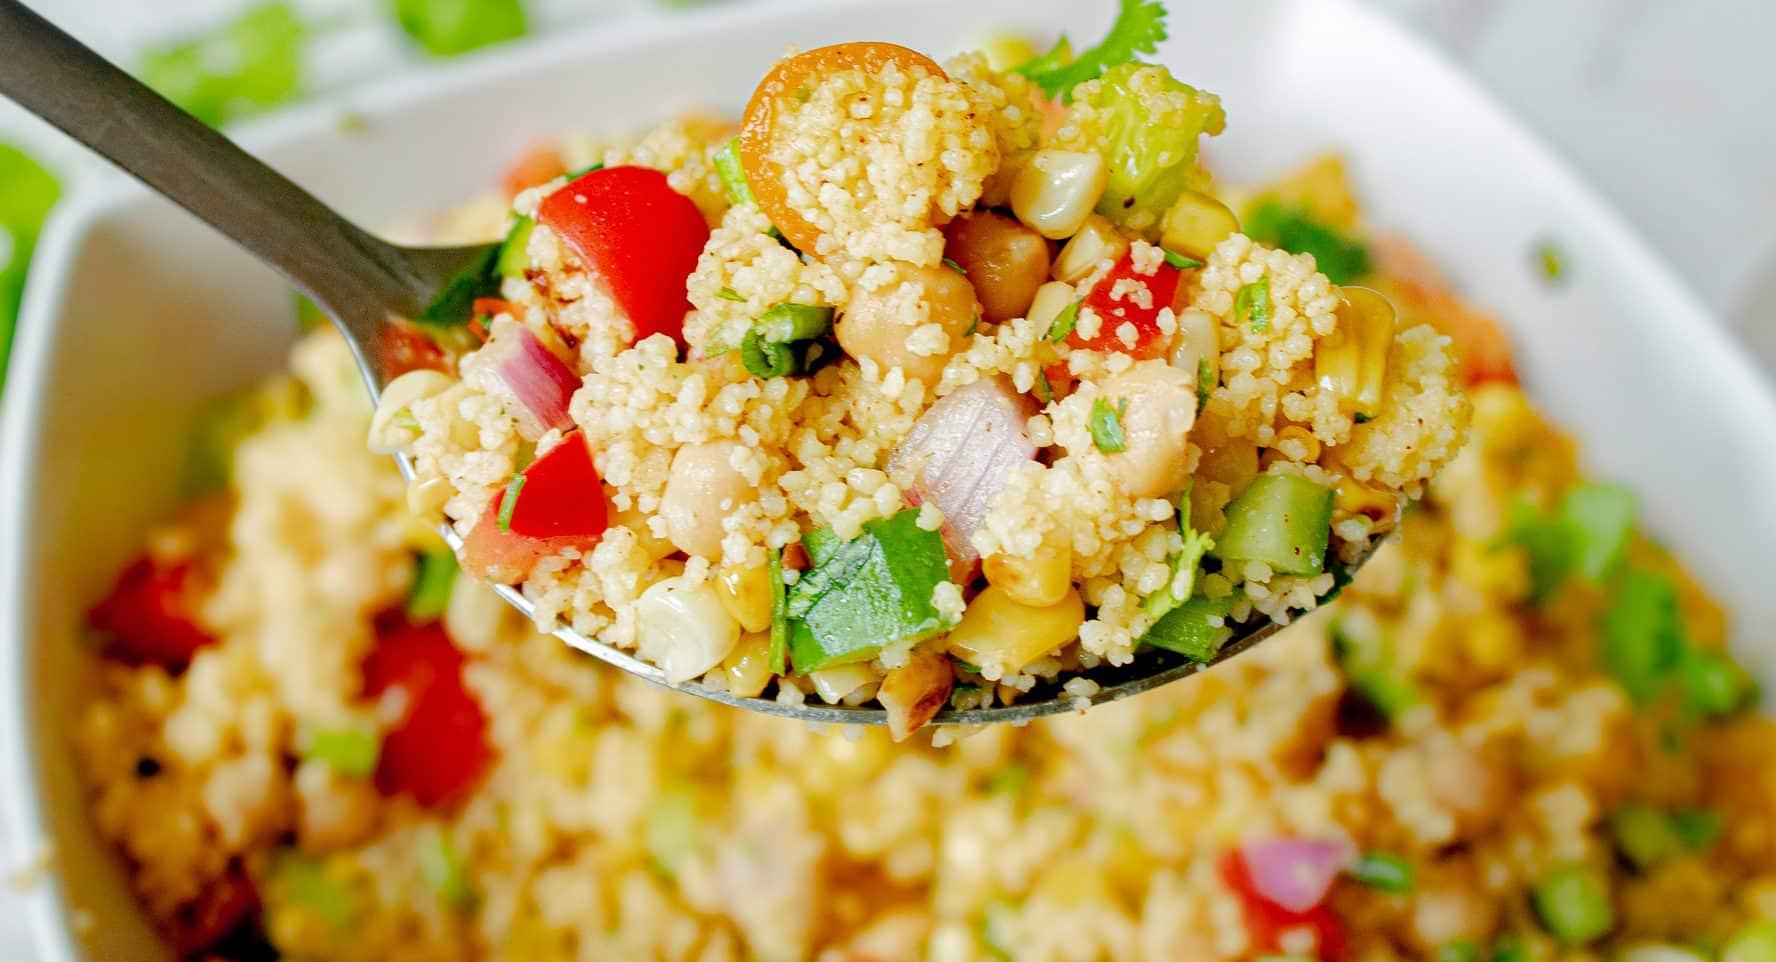 Vegan Couscous Salad - Cold Couscous Salad with Cumin Lime Dressing!   Chenée Today